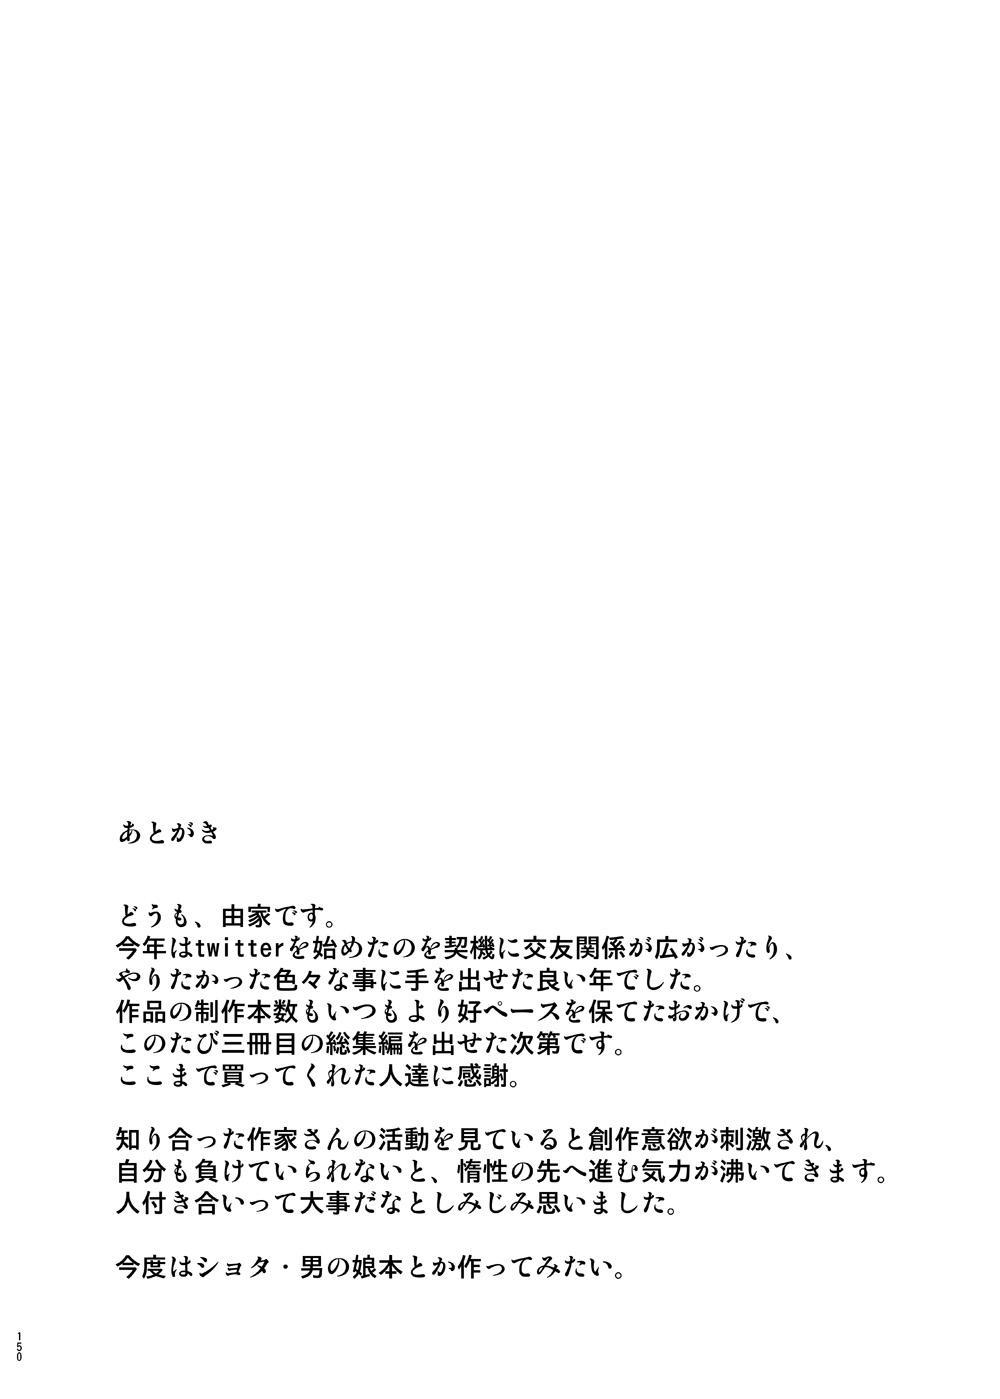 Saimin Katei Kyoushi no Inkou Seijin Muke Soushuuhen 147